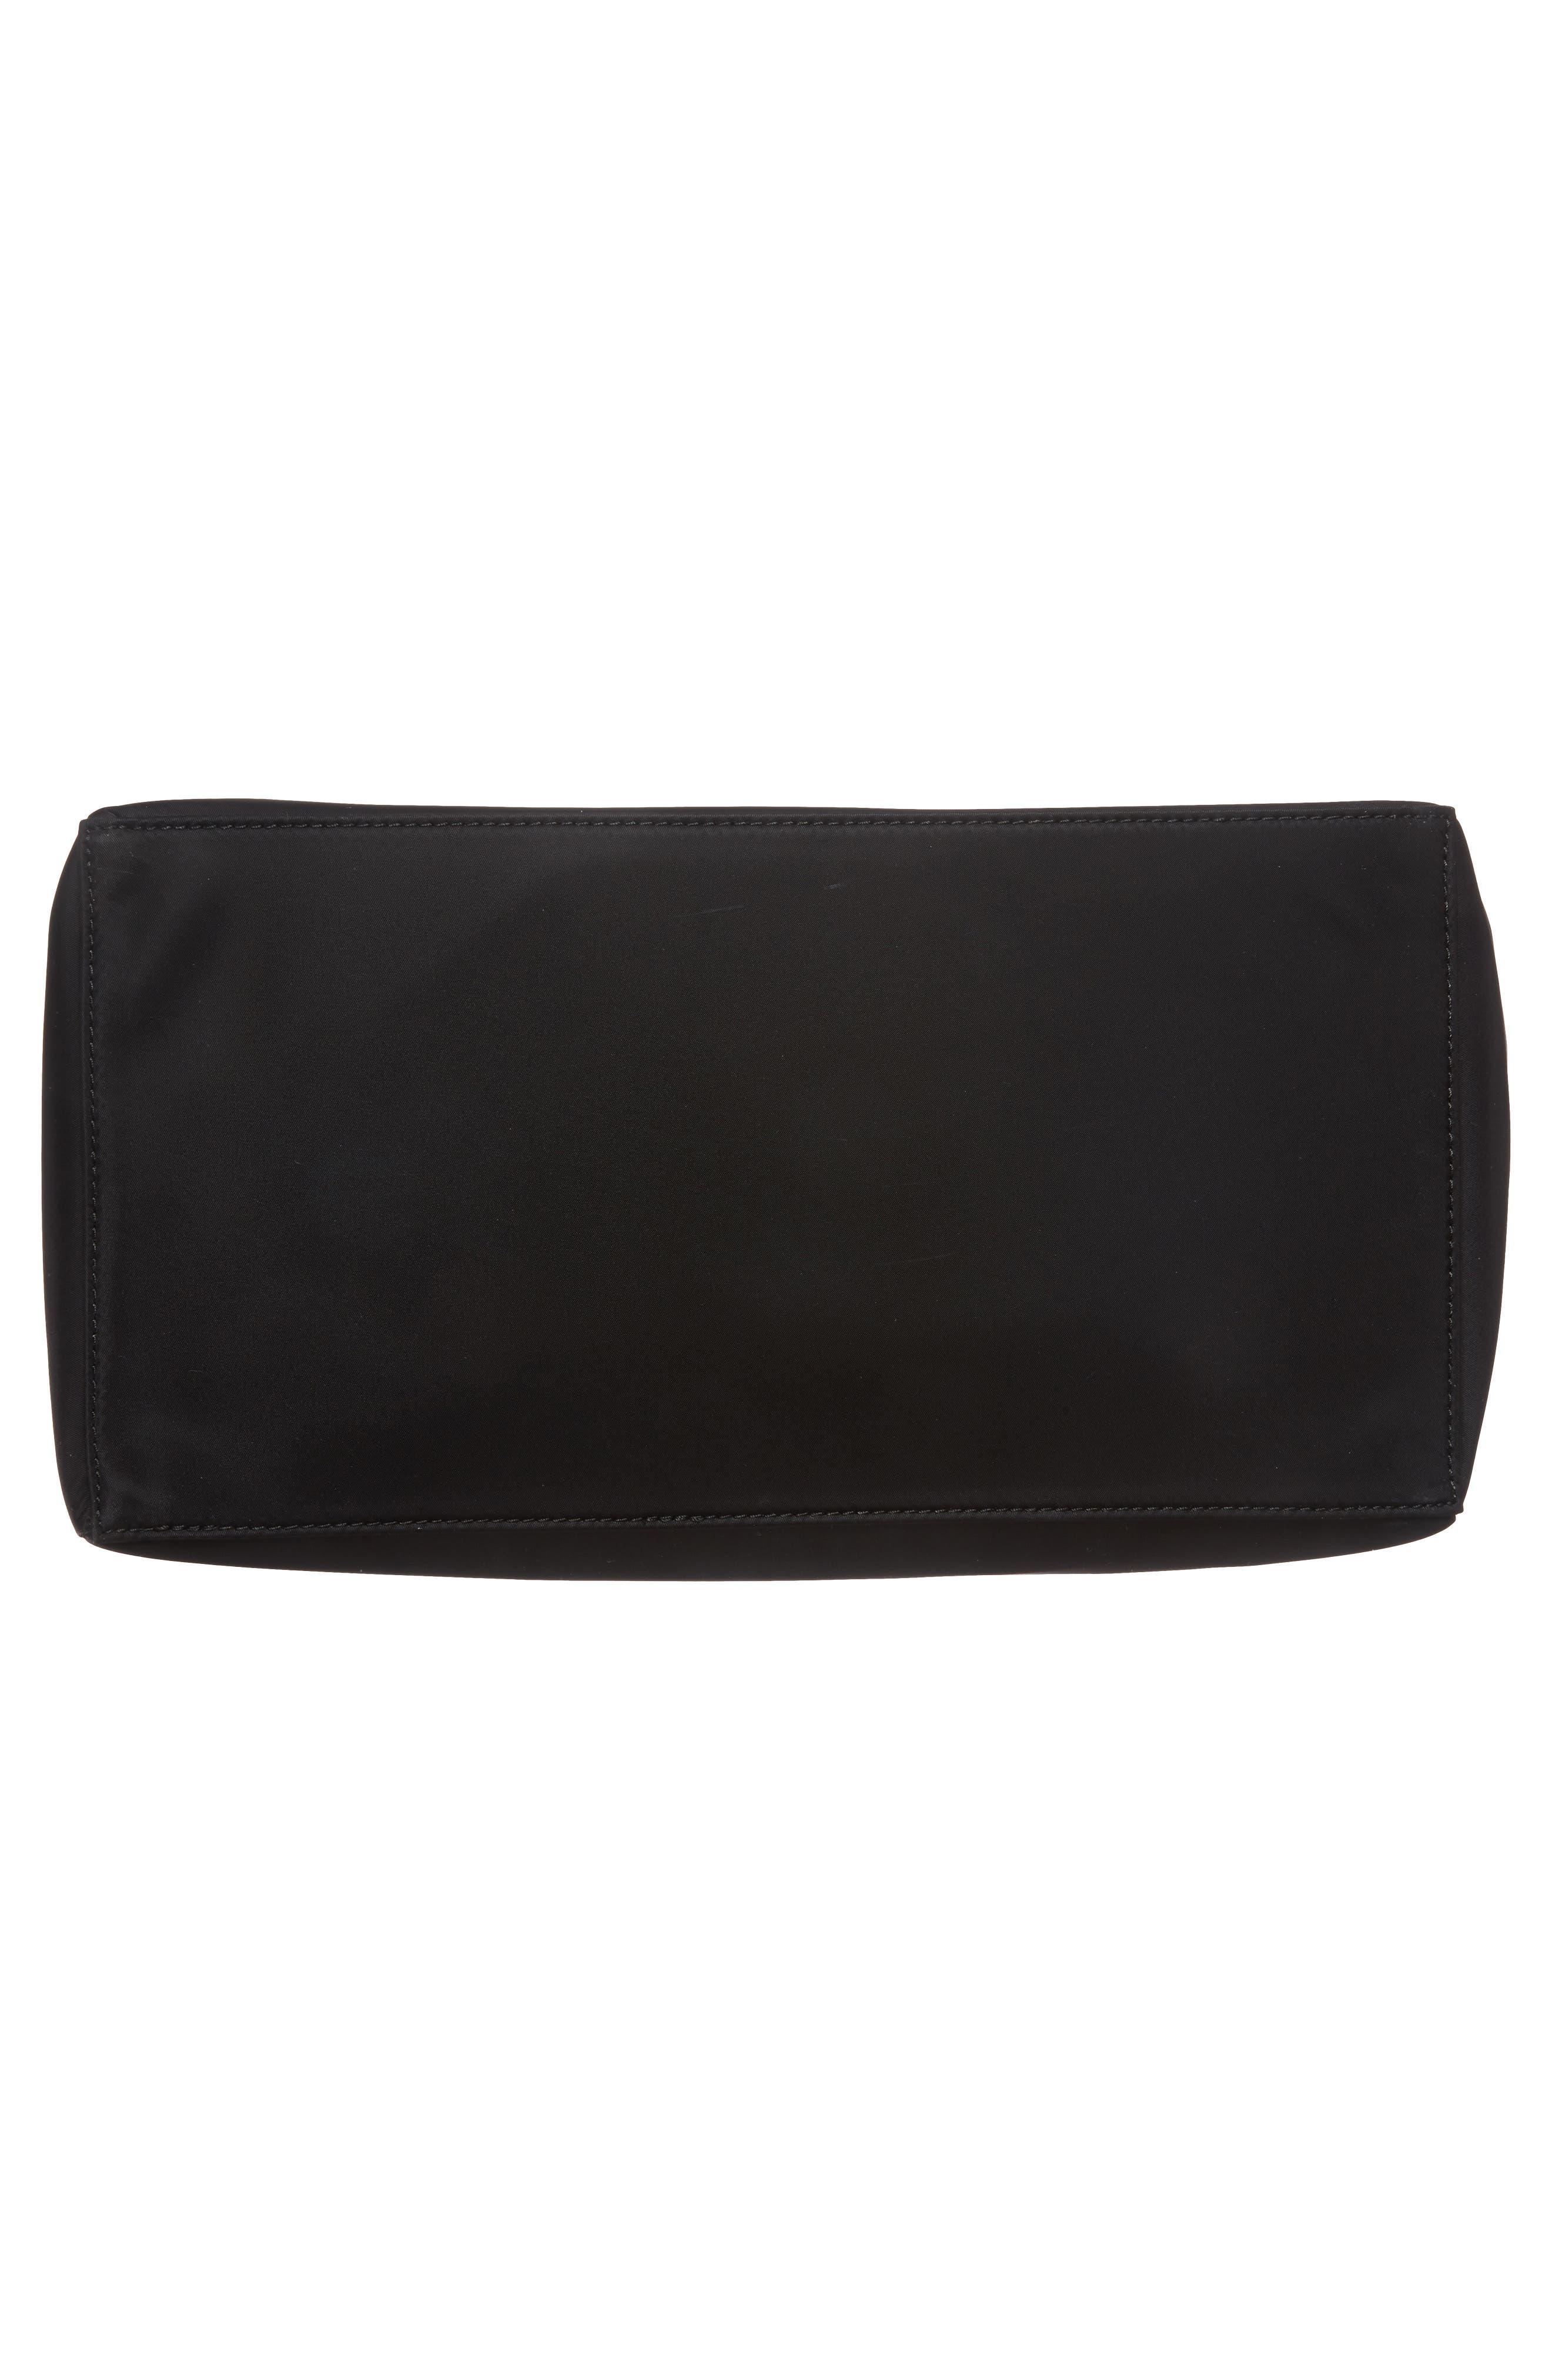 kate spade watson lane betheny nylon diaper bag,                             Alternate thumbnail 16, color,